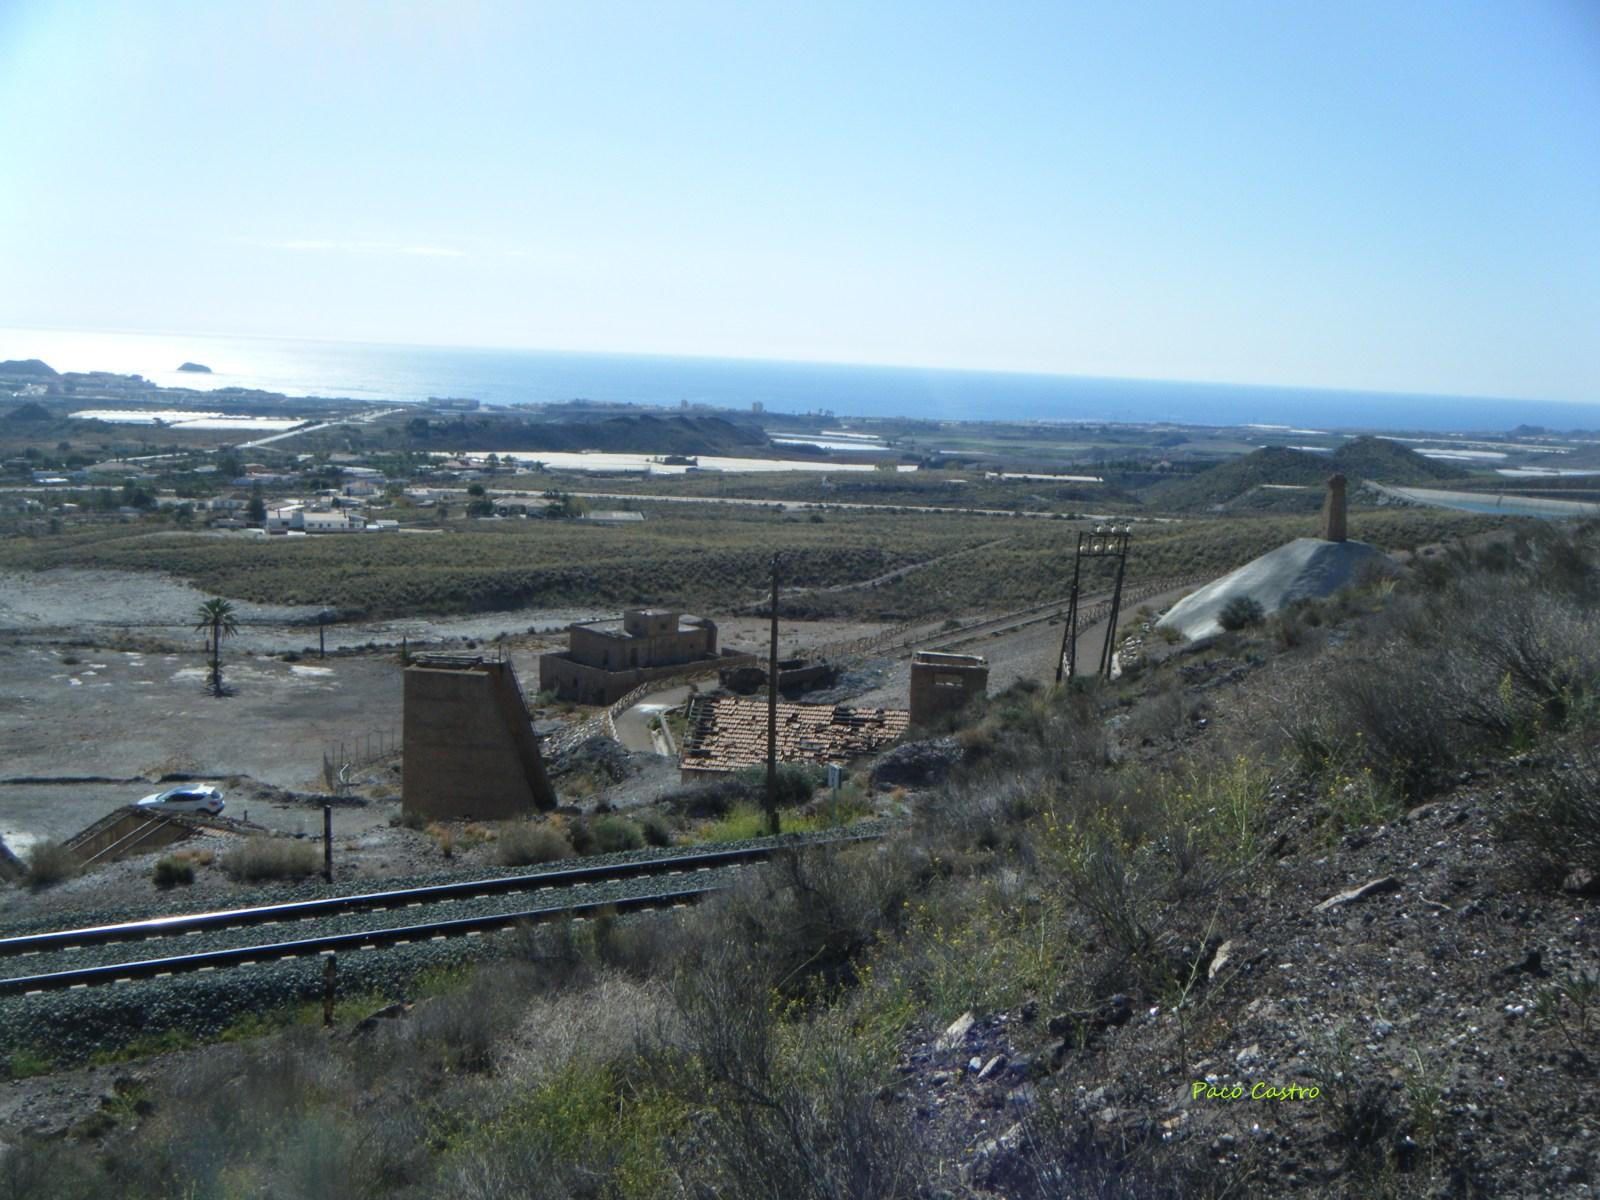 Corta San José, Pilar de Jaravía, Pulpi, Almeria, Andalucia, España 2v8pjpj